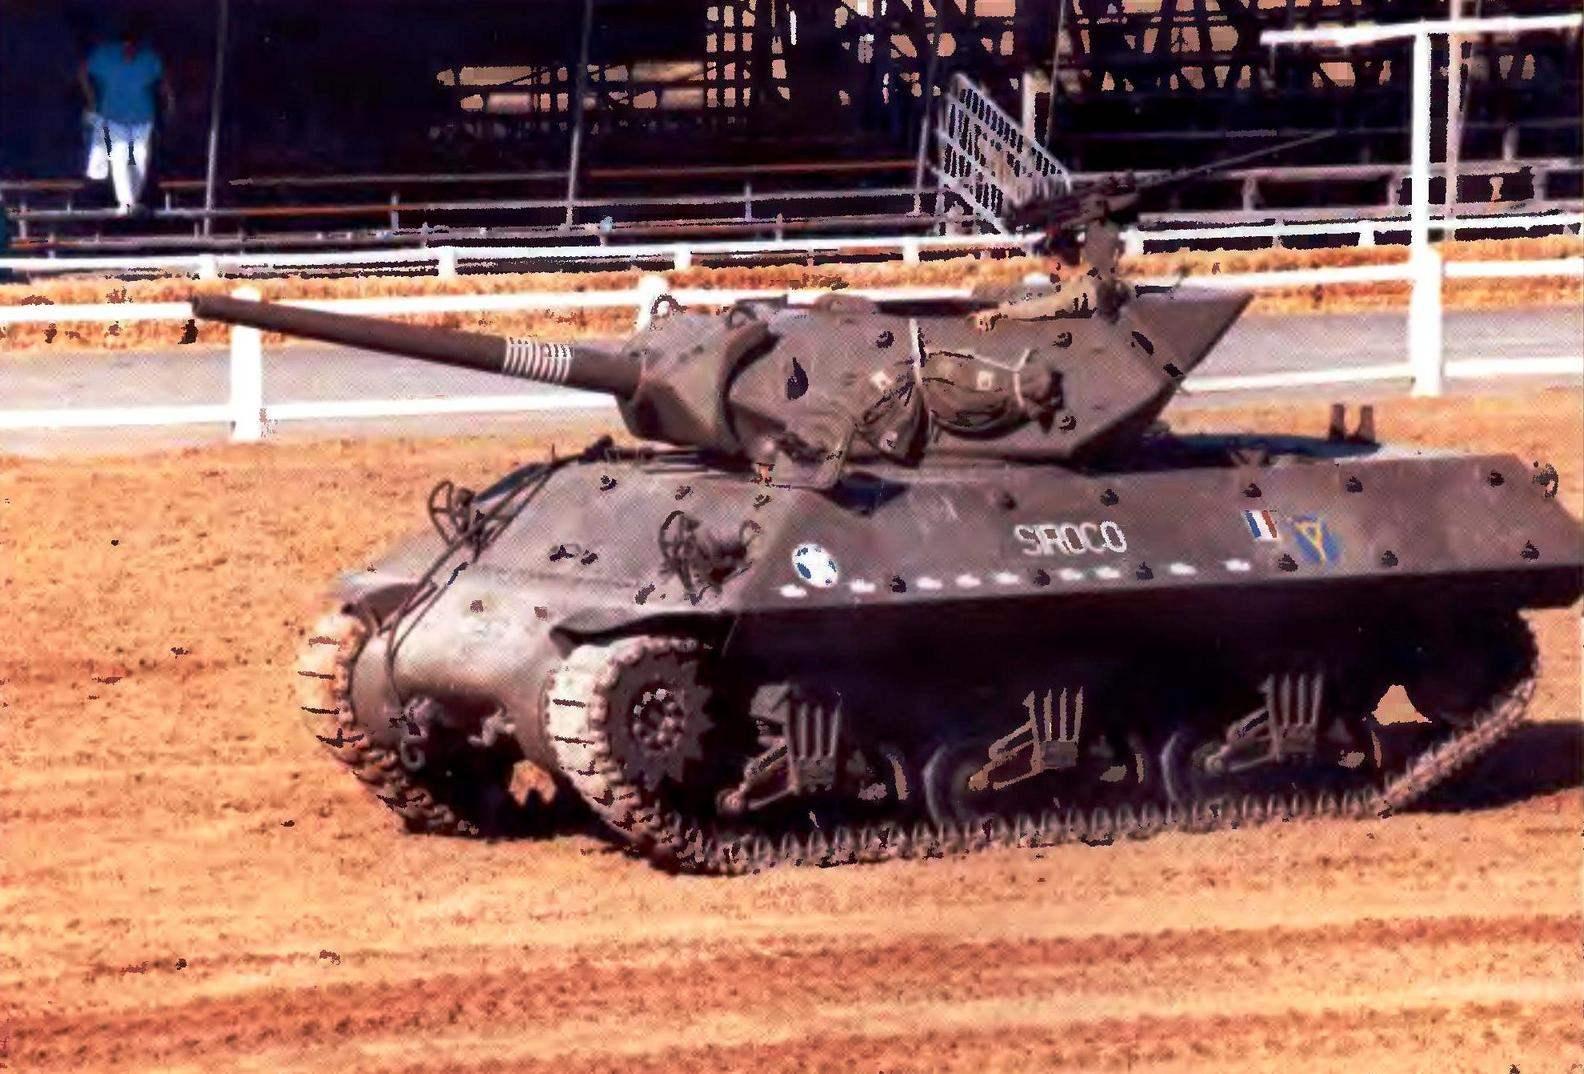 Истребитель танков М10 во время показа в танковом музее в Самюре, Франция. Фото Стивена Залоги (США)